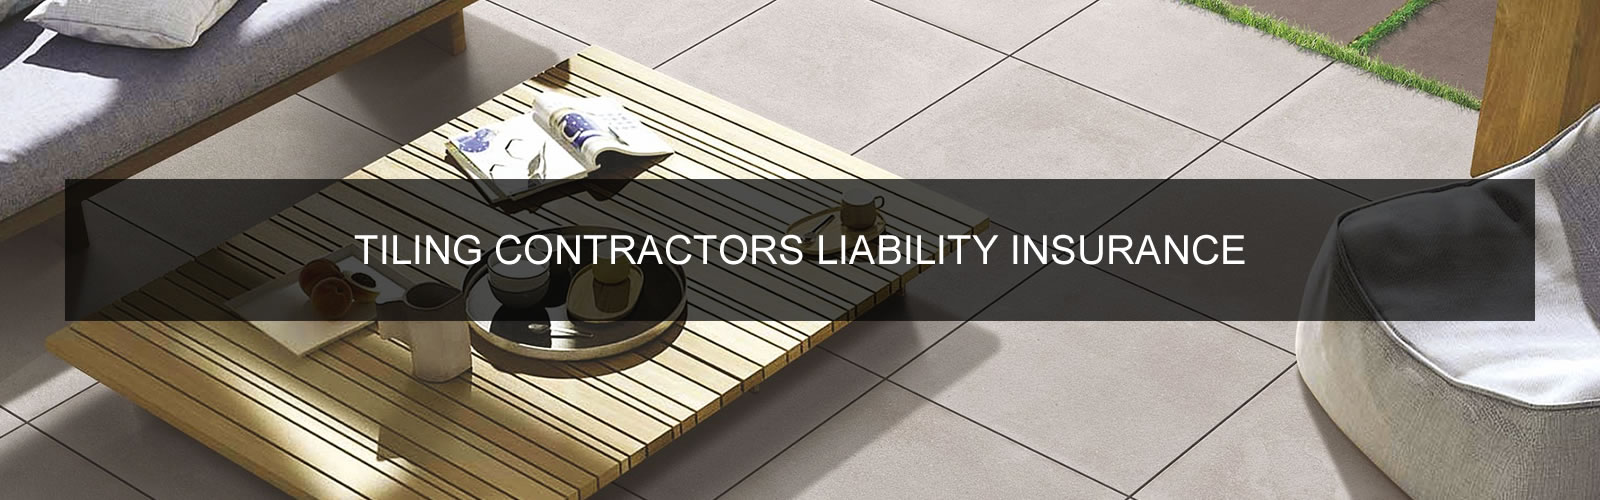 Tiling Contractors Liability Insurance